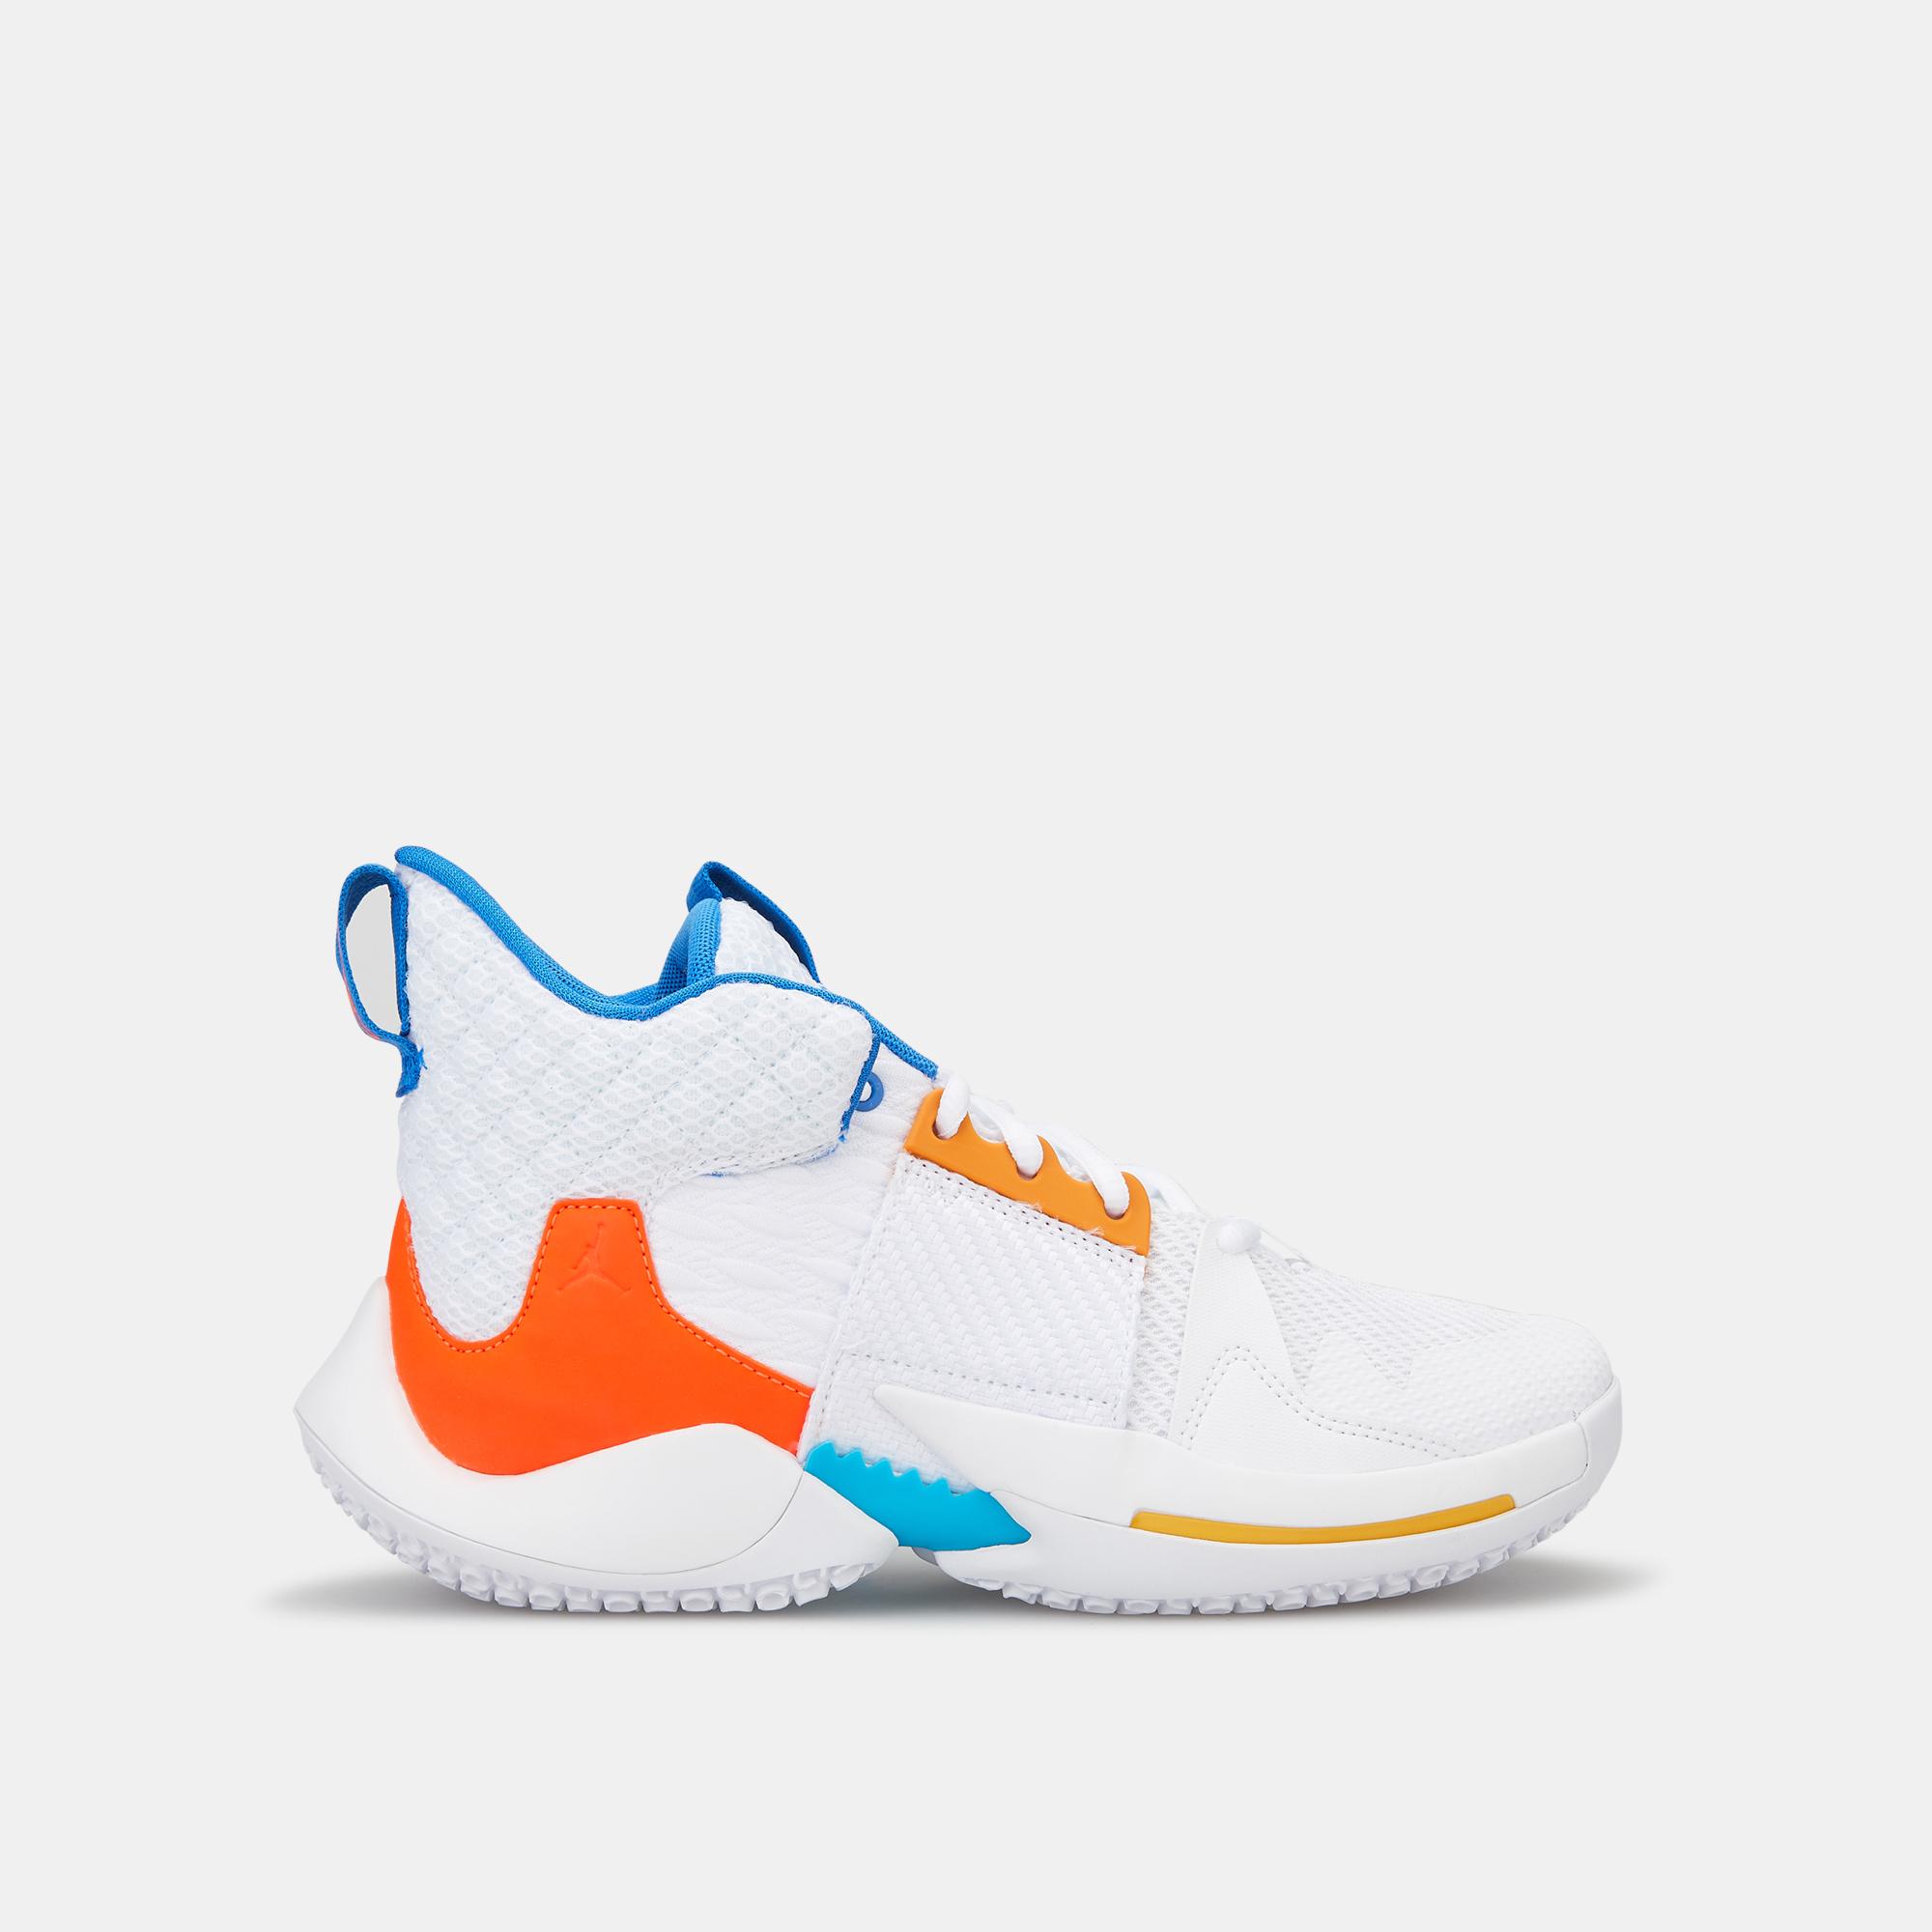 a029a10a1192 Jordan Kids  Air Jordan Why Not Zero.2 Shoe (Older Kids)